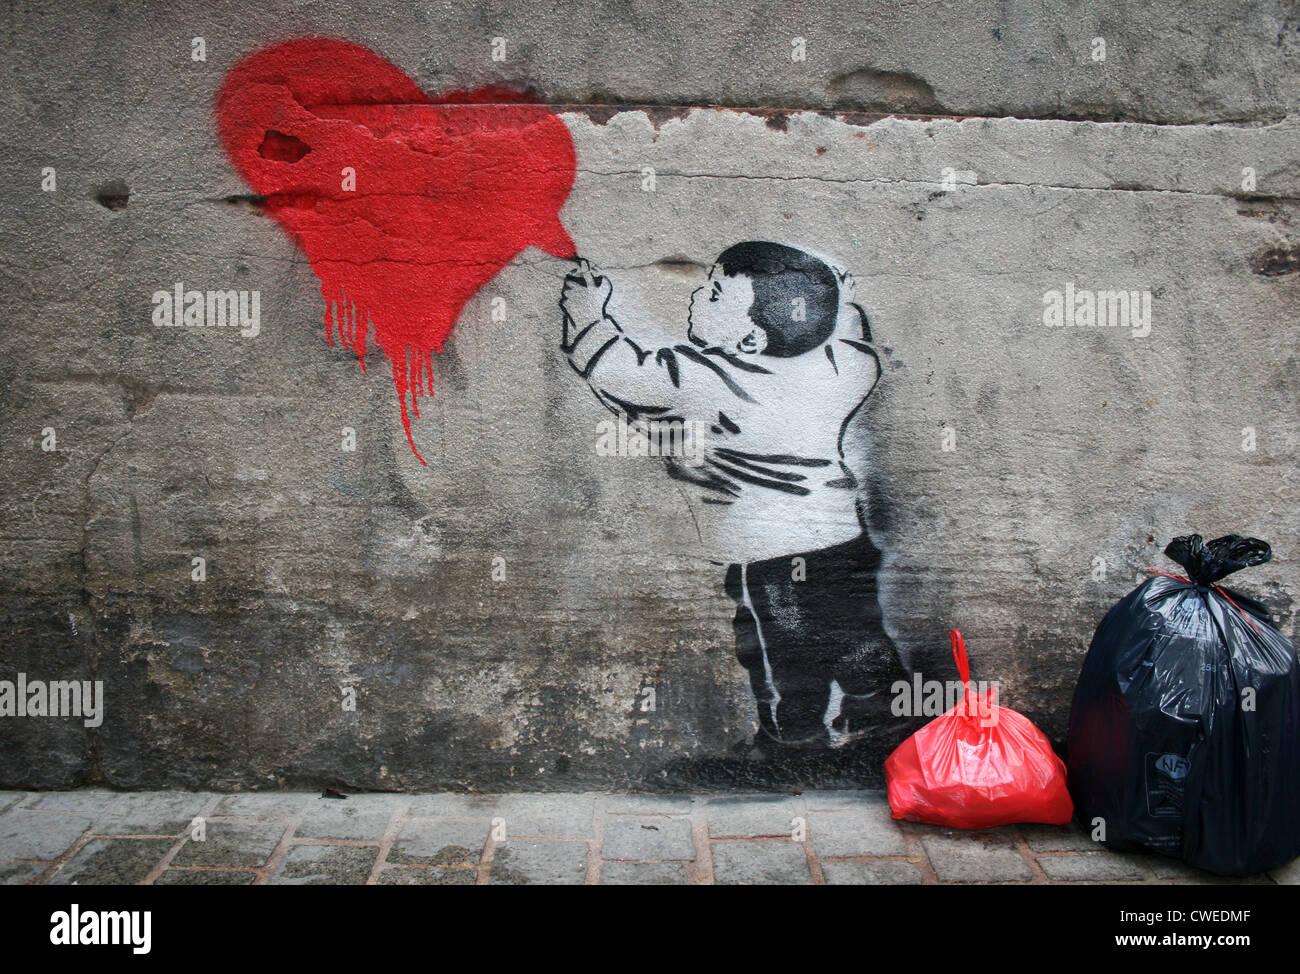 Herz, Spritzen, Graffiti, streetart Stockbild